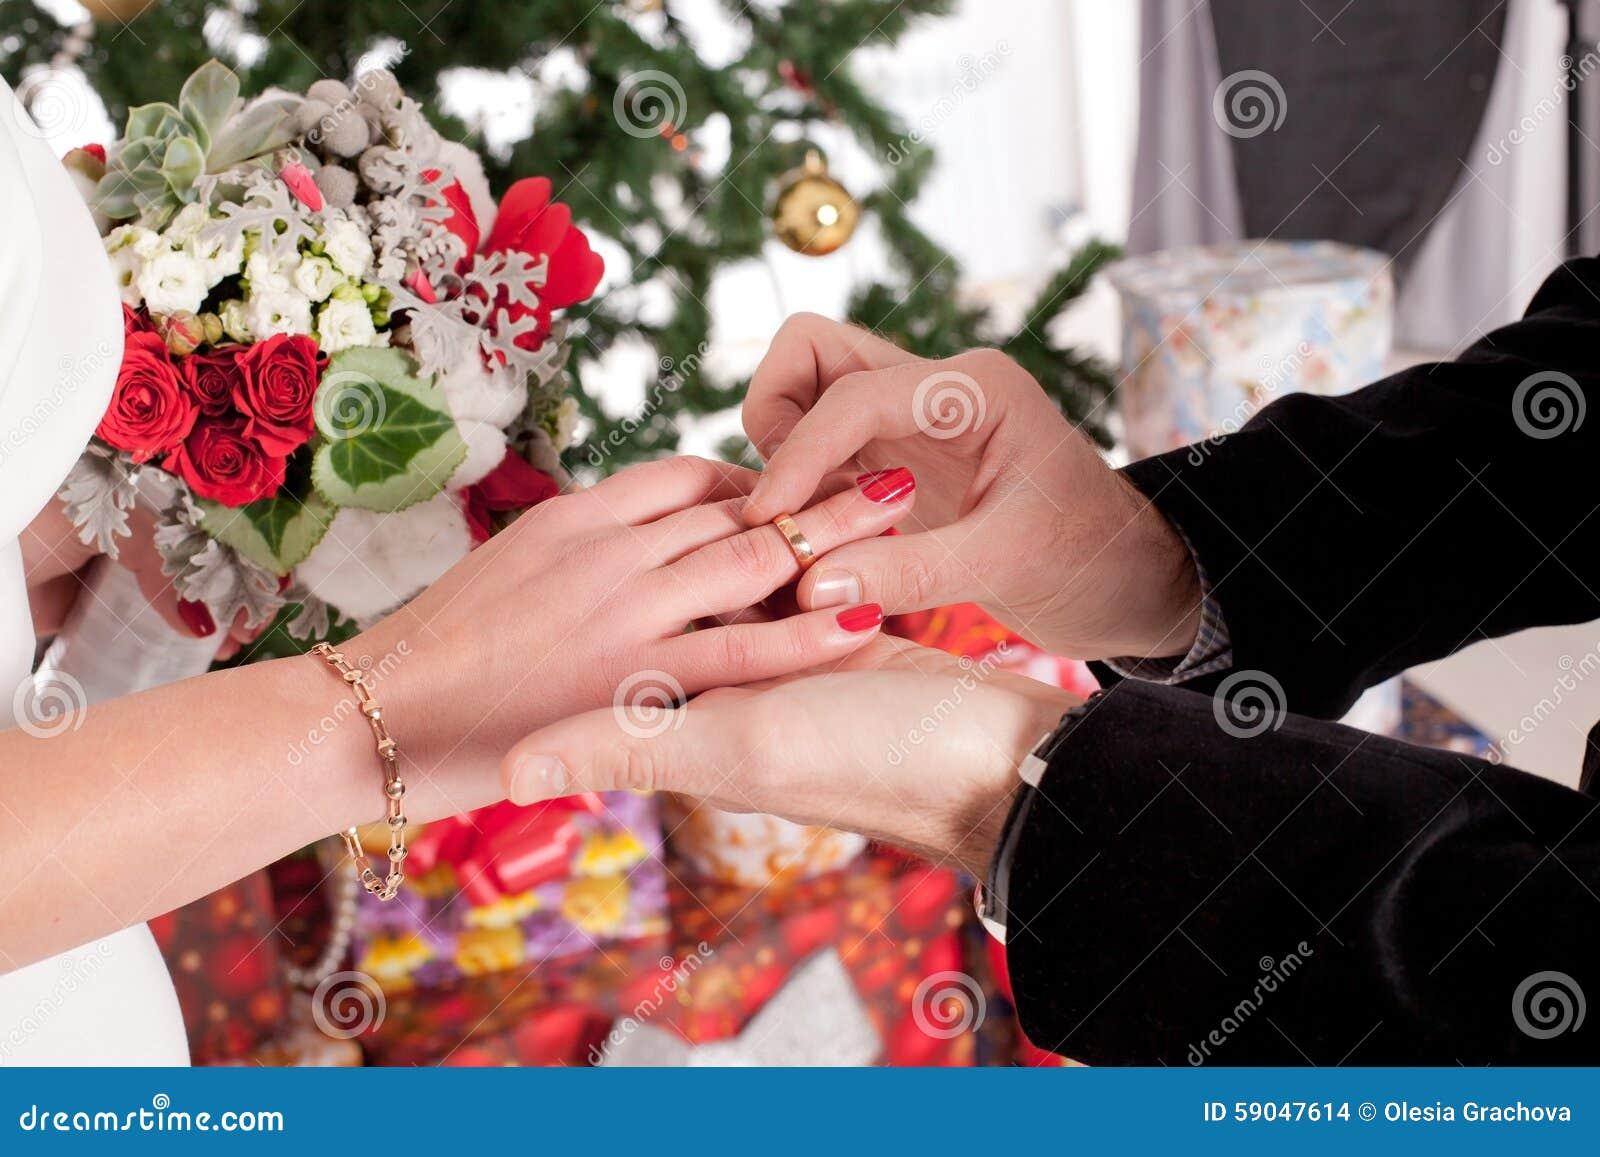 Man Putting Wedding Ring On Woman Hand Stock Photo - Image of ...